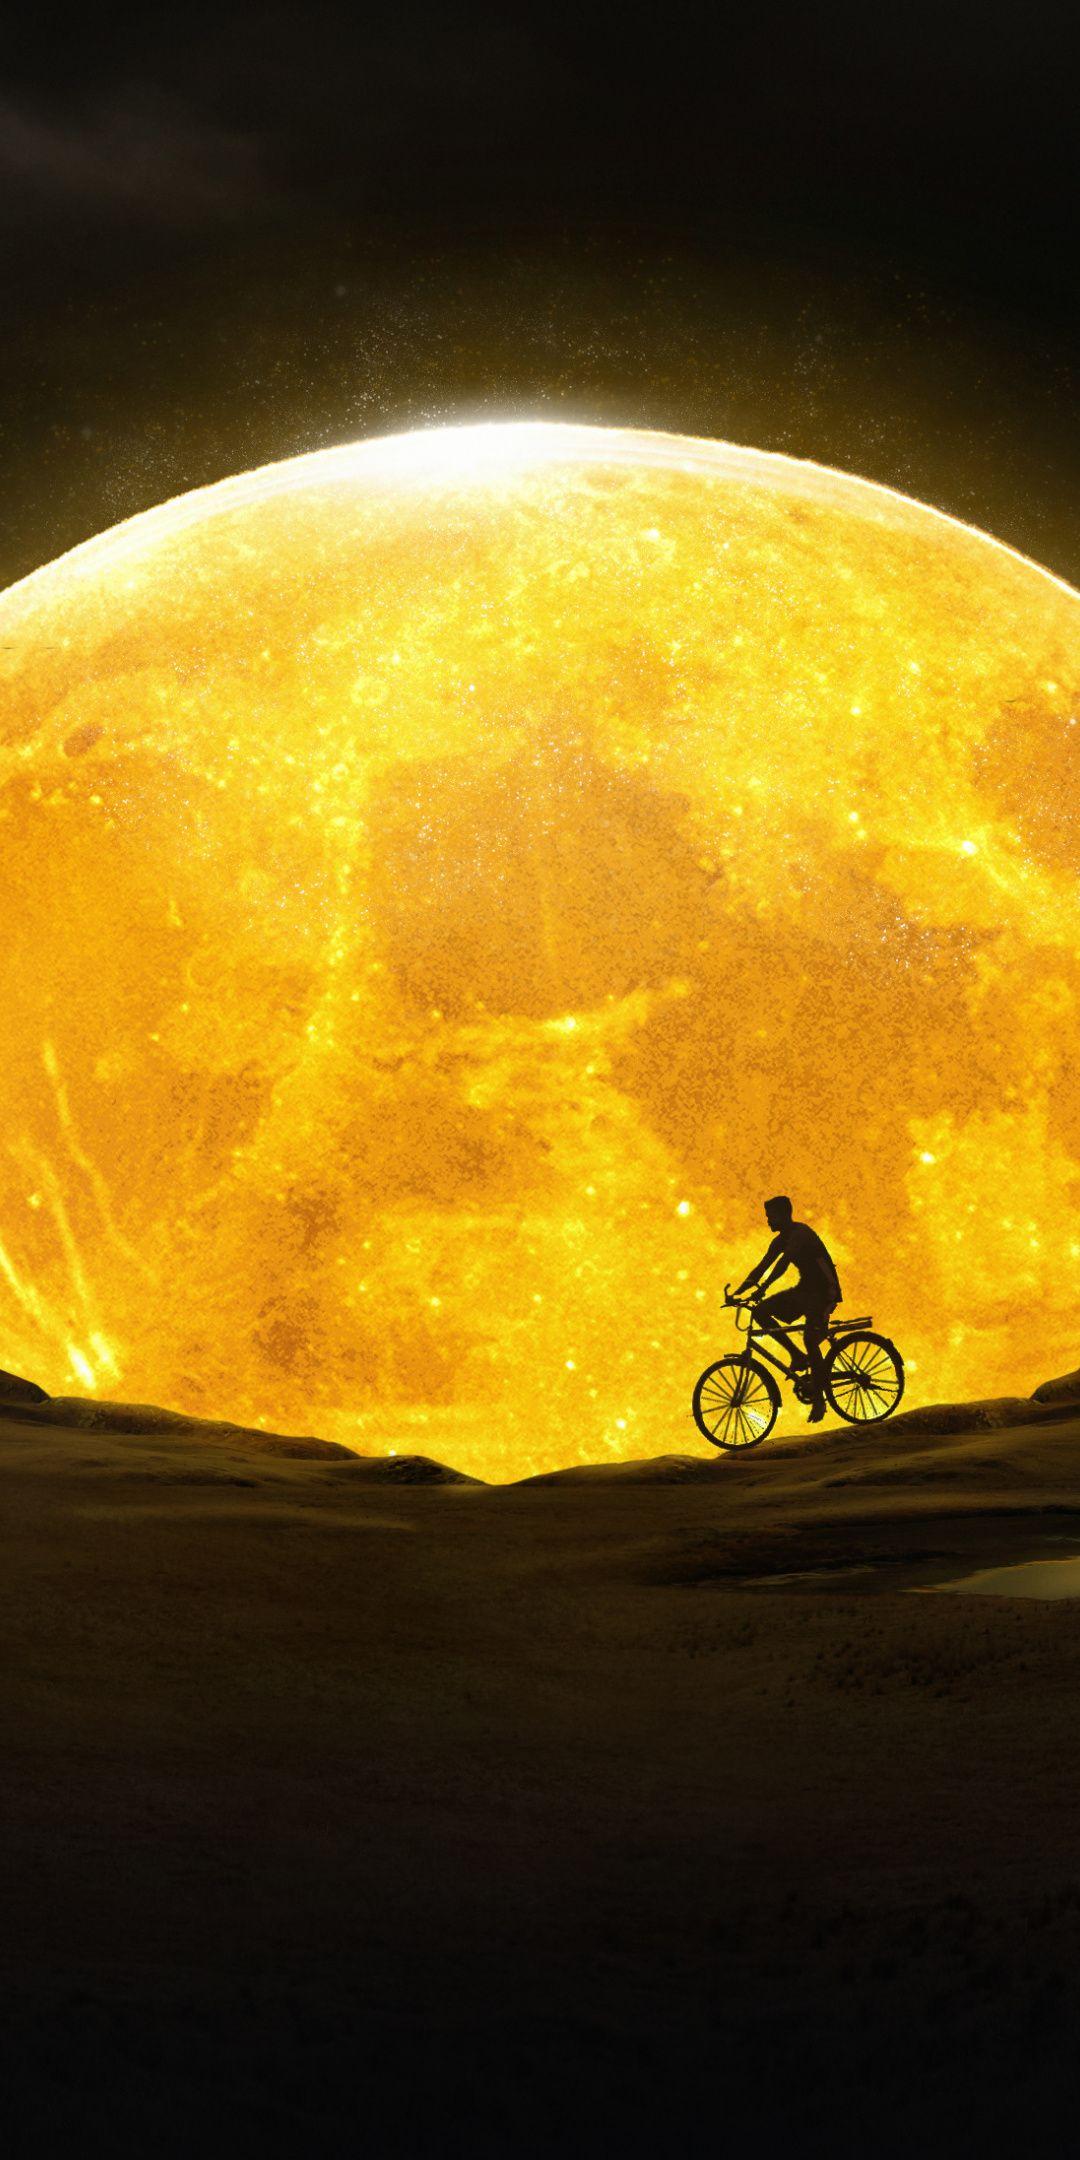 1080x2160 Moon Night Yellow Moon Cycling Silhouette Art